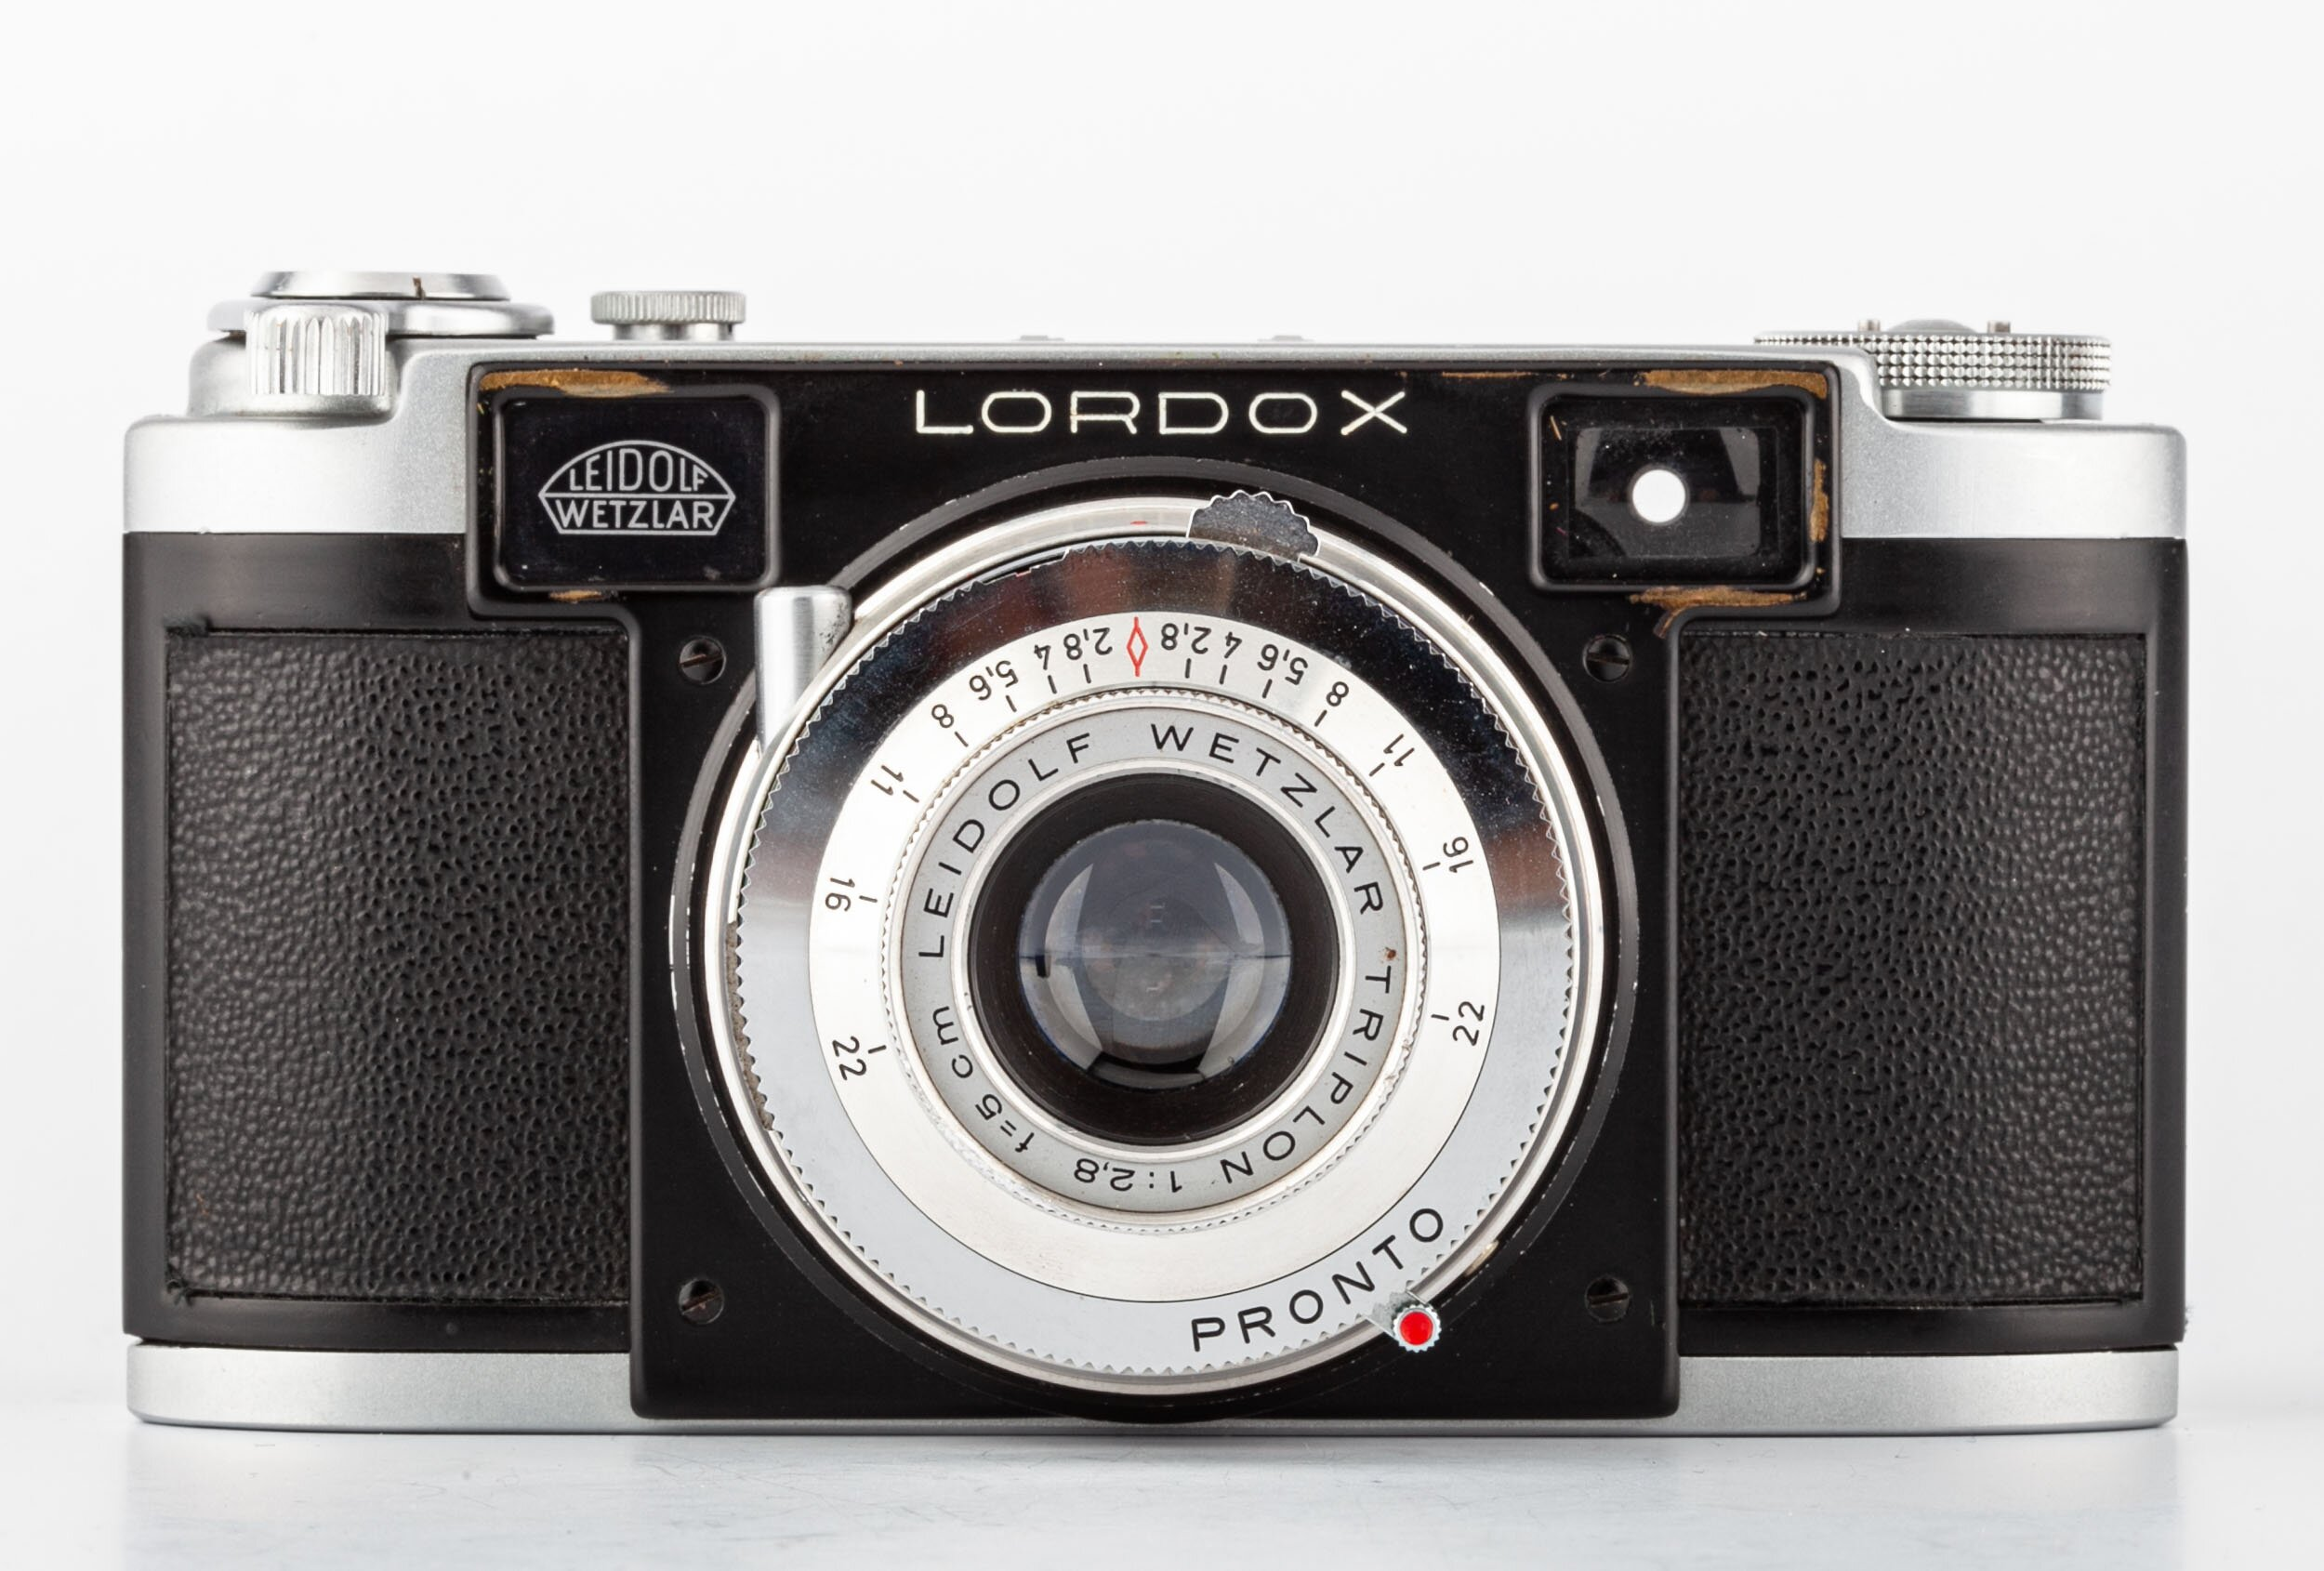 Lordox Leidolf Wetzlar Triplon 5cm F2.8